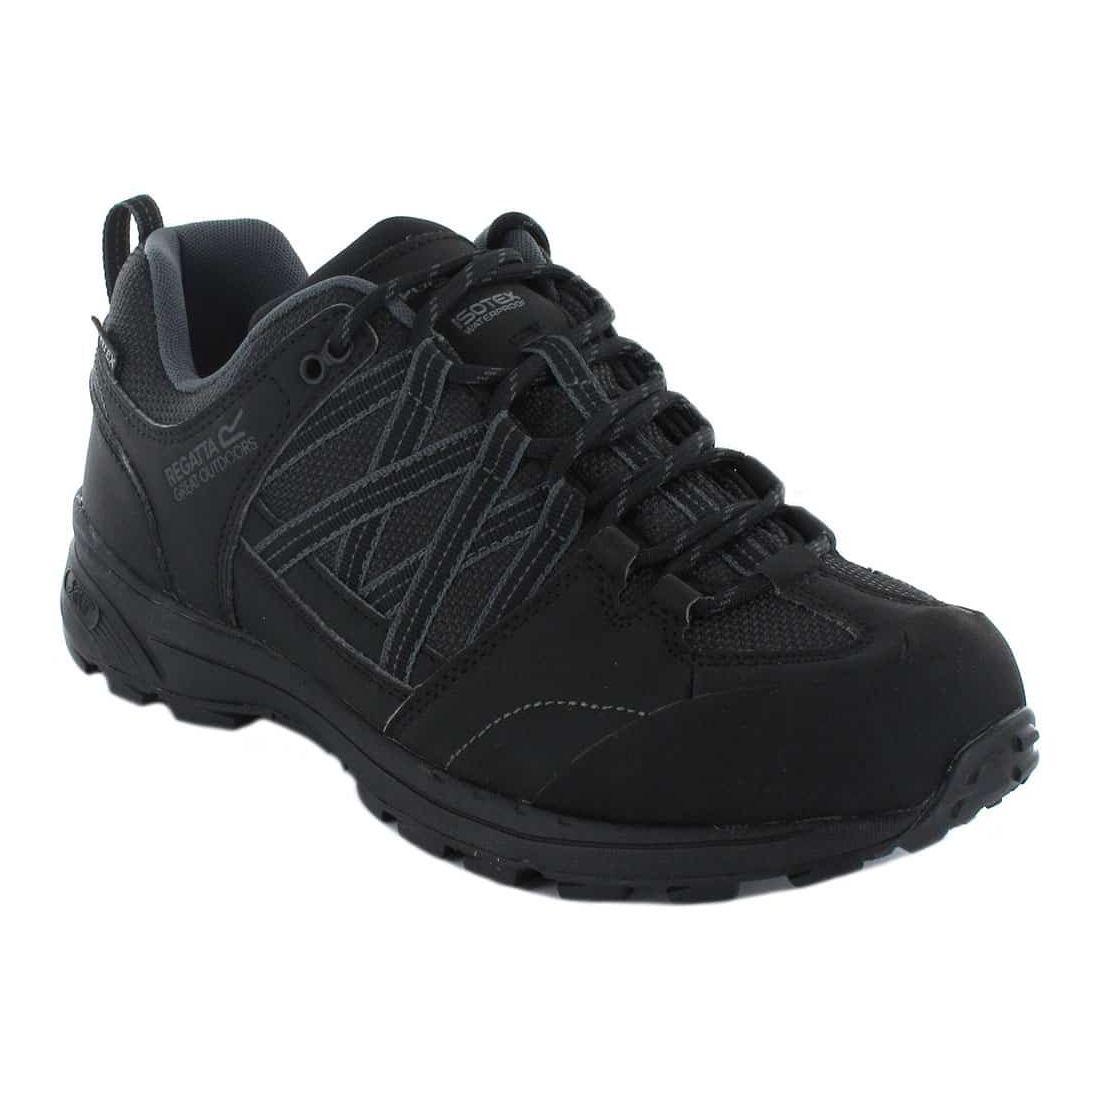 Regatta Samaris II Low - Running Shoes Trekking Man